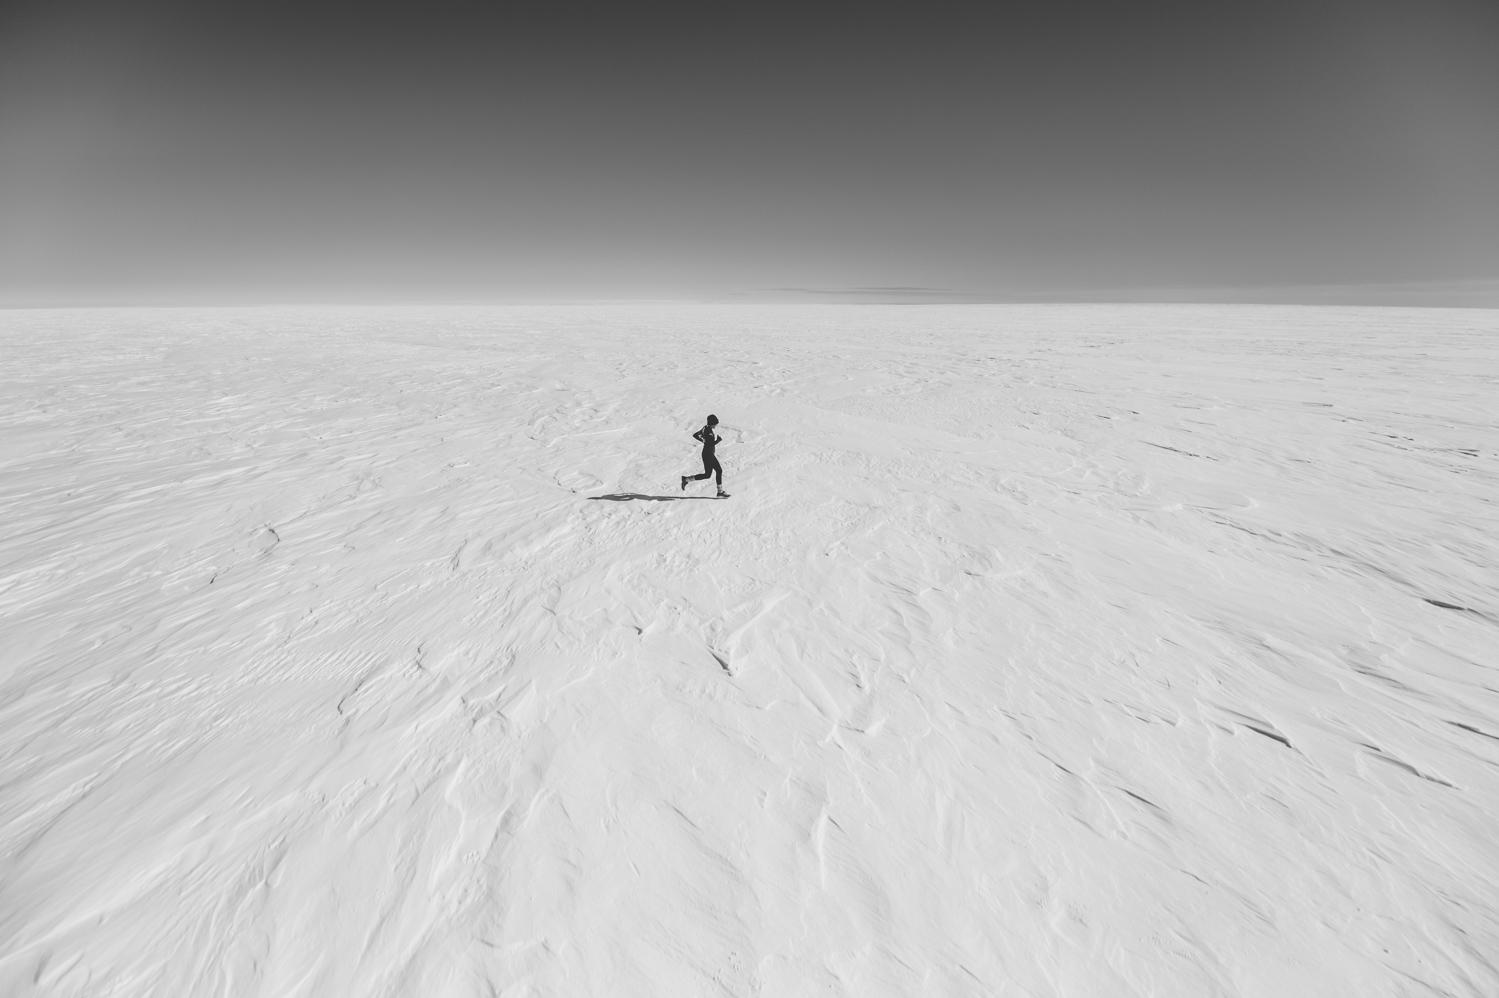 KT_160219_7D_Antarctica_7135.jpg